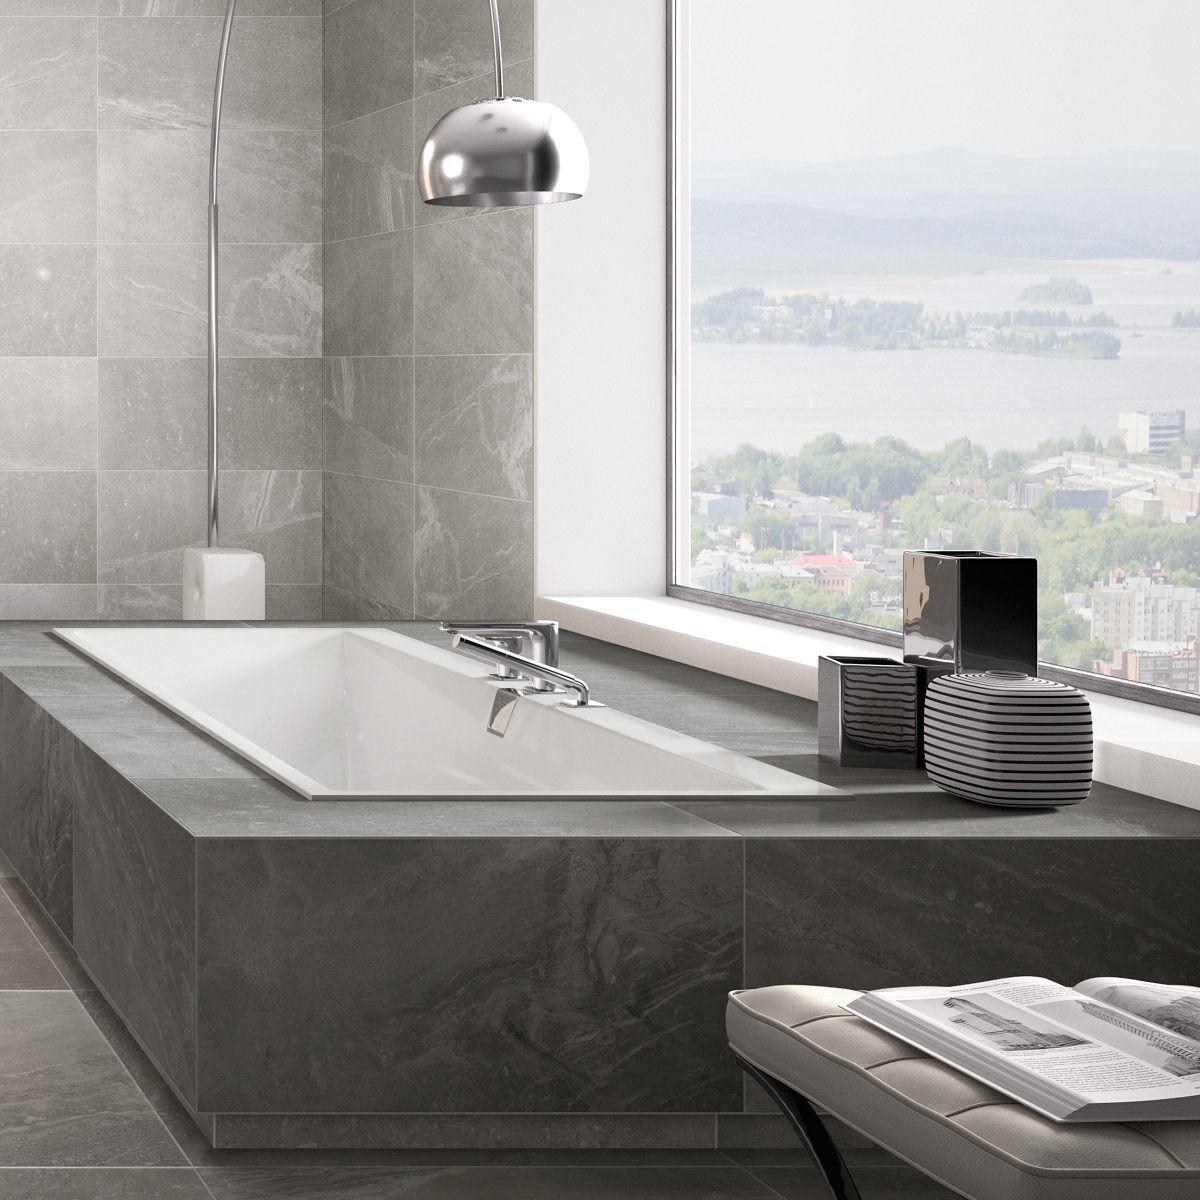 Villeroy and boch squaro edge 12 luxury bath uk bathrooms for Villeroy and boch bathroom accessories